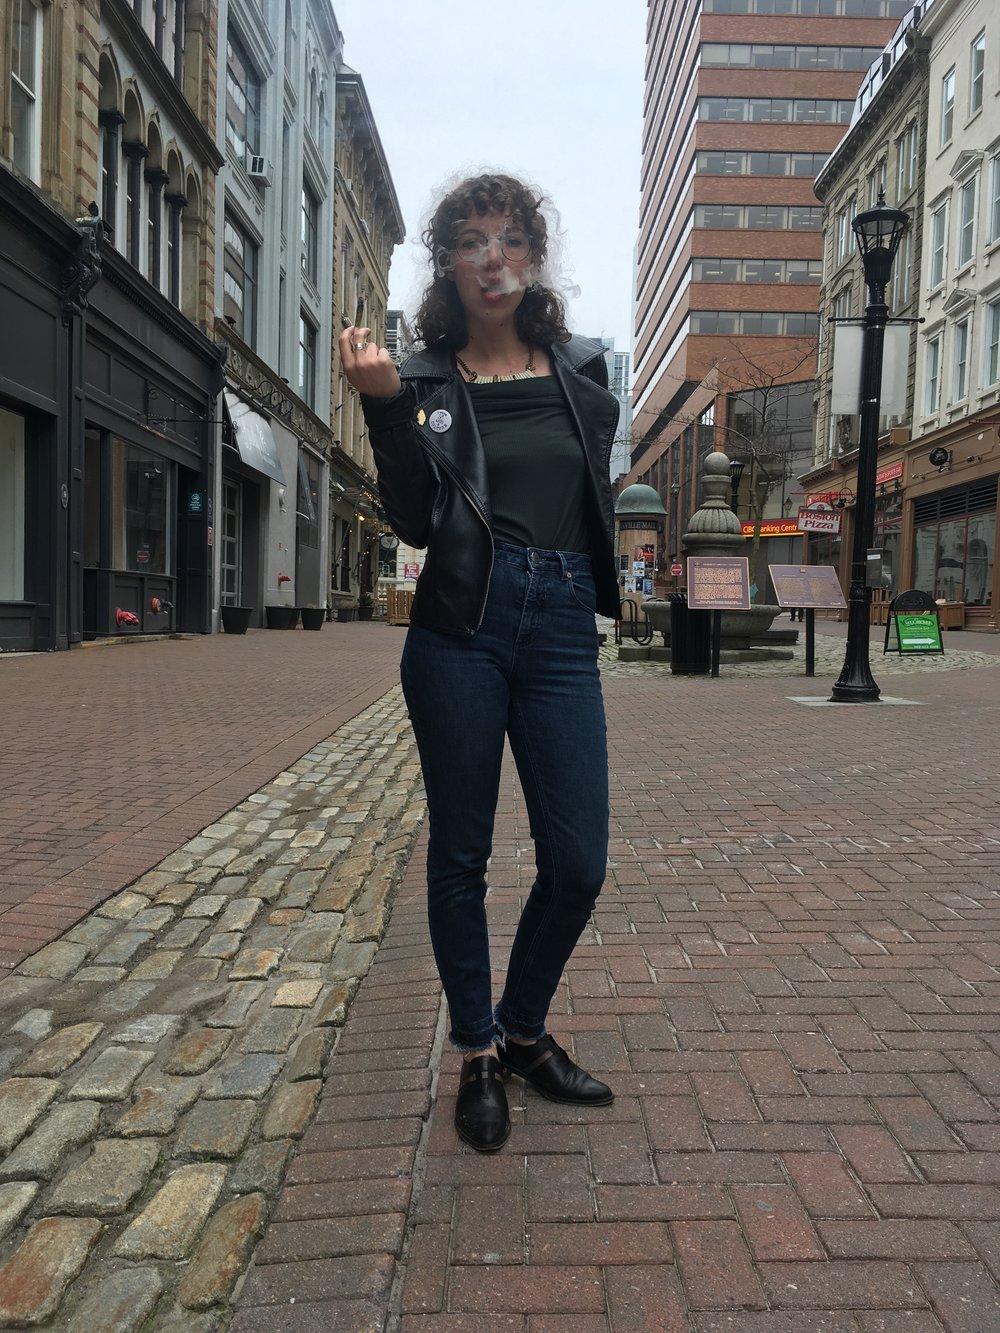 Annie MacEachern smoking-up in the streets of Halifax.  Photo credit: Aimee Power